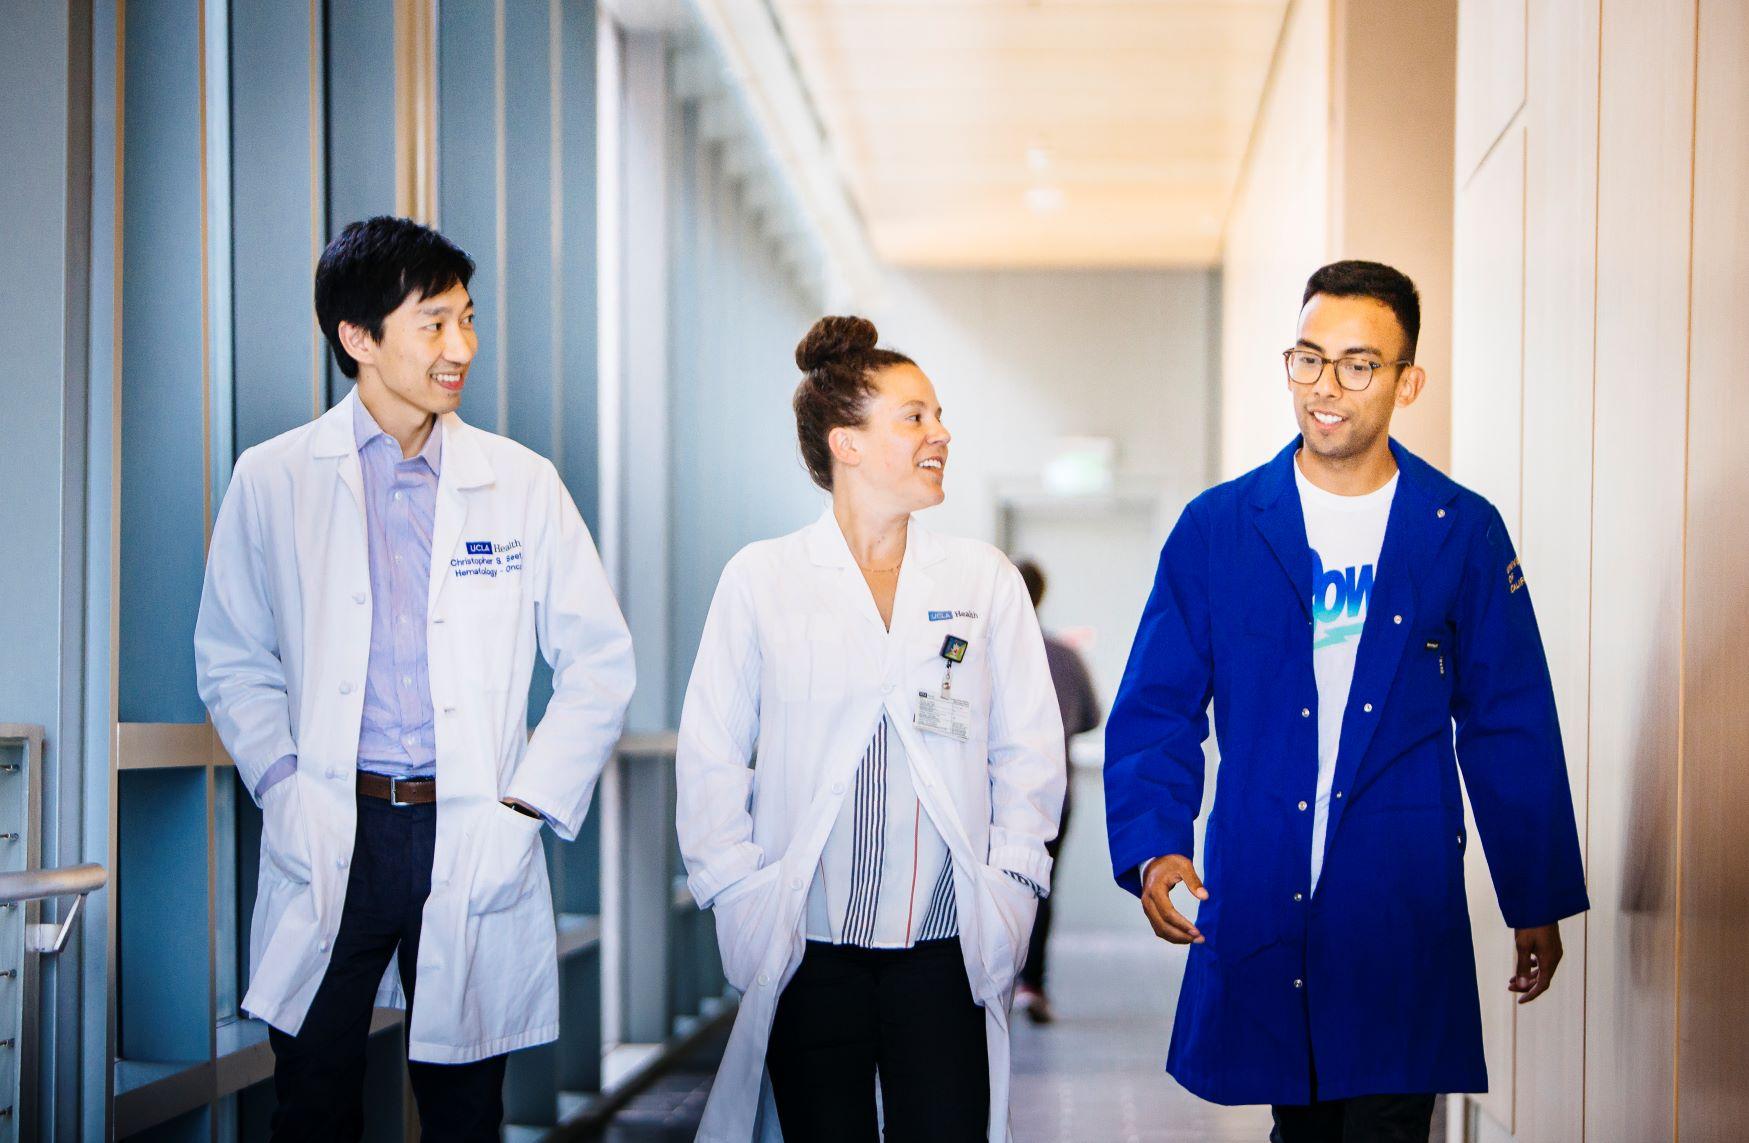 Csun 2022 Calendar.Csun Ucla Stem Cell Scientist Training Program Ucla Broad Stem Cell Center